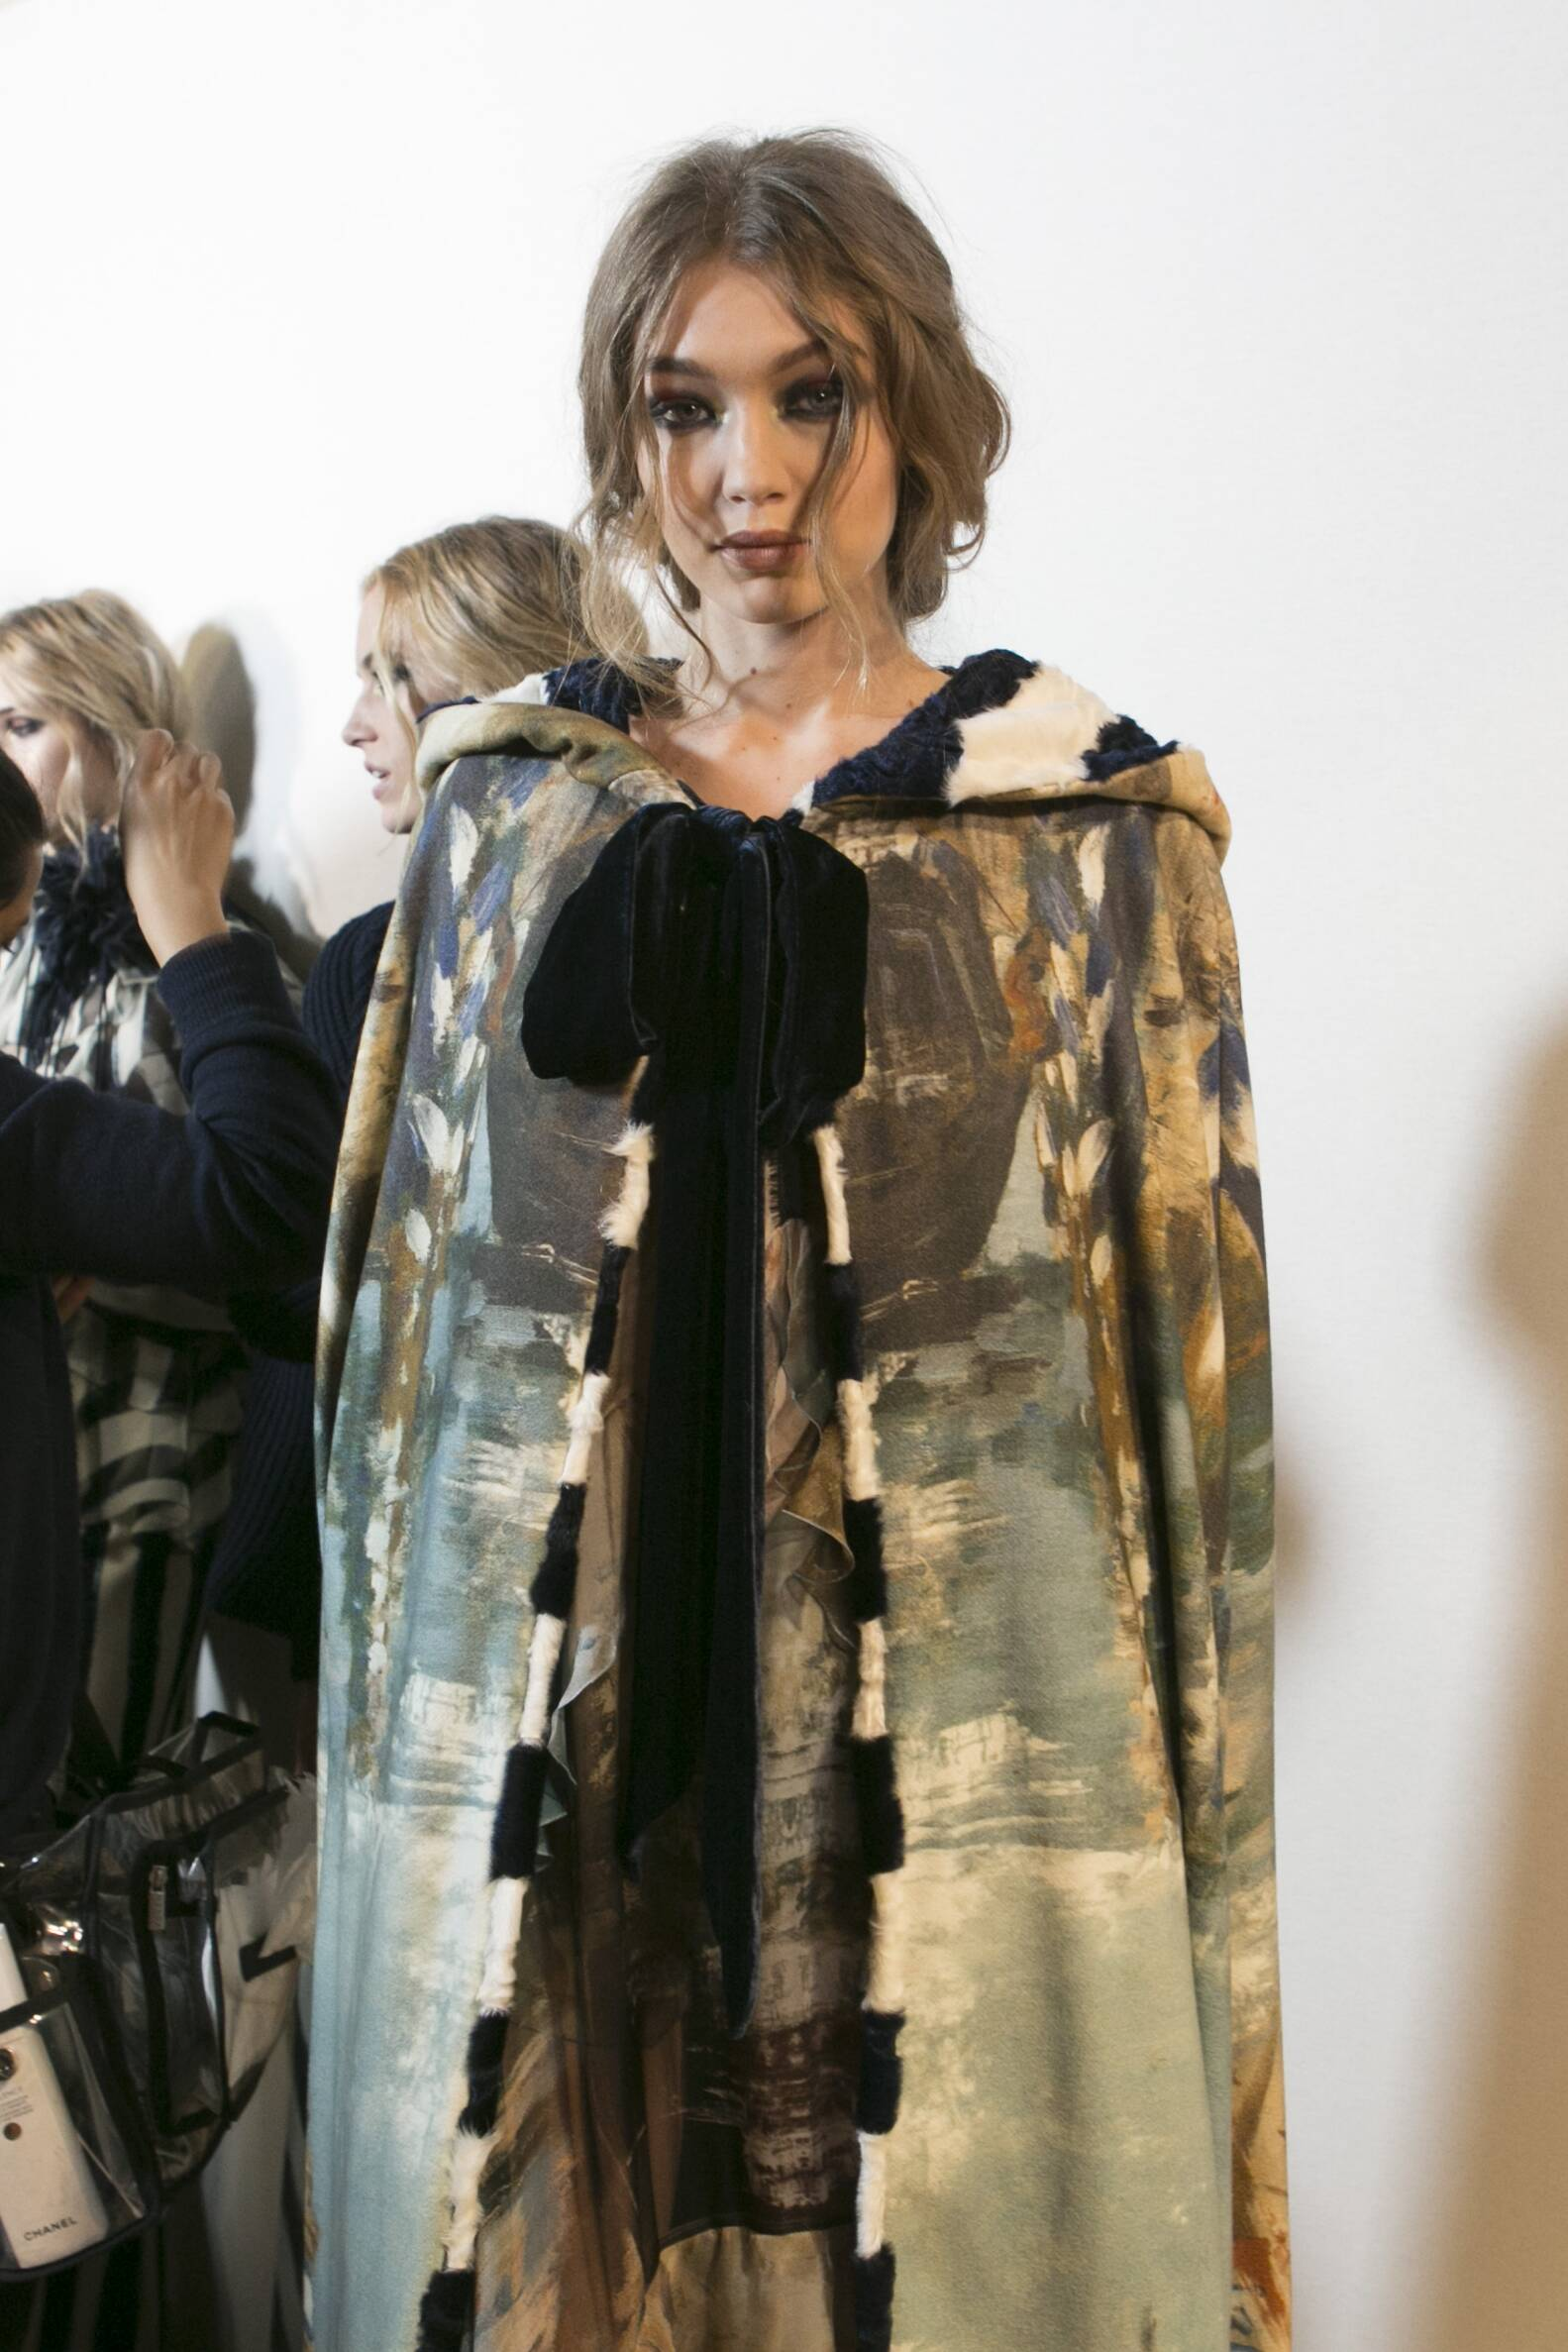 Backstage Alberta Ferretti Gigi Hadid Fall Winter 2017 Milan Fashion Week